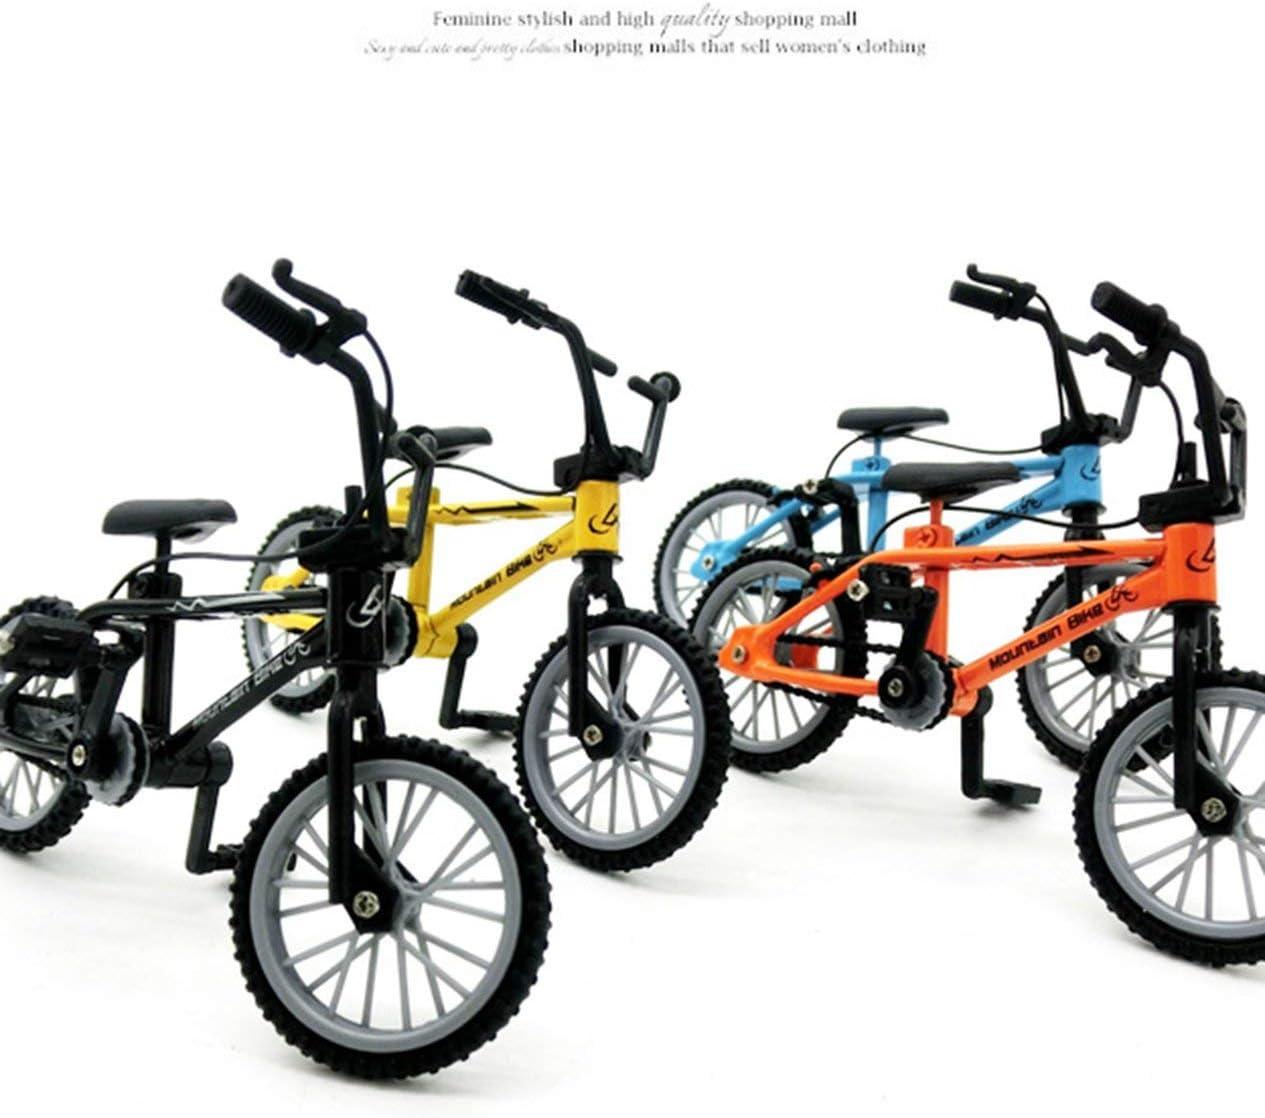 Mini-Finger-BMX Set Bike Fans Toy Alloy Finger BMX Functional Kids Bicycle modle Finger Bike BMX Toys Gift-Black BCVBFGCXVB